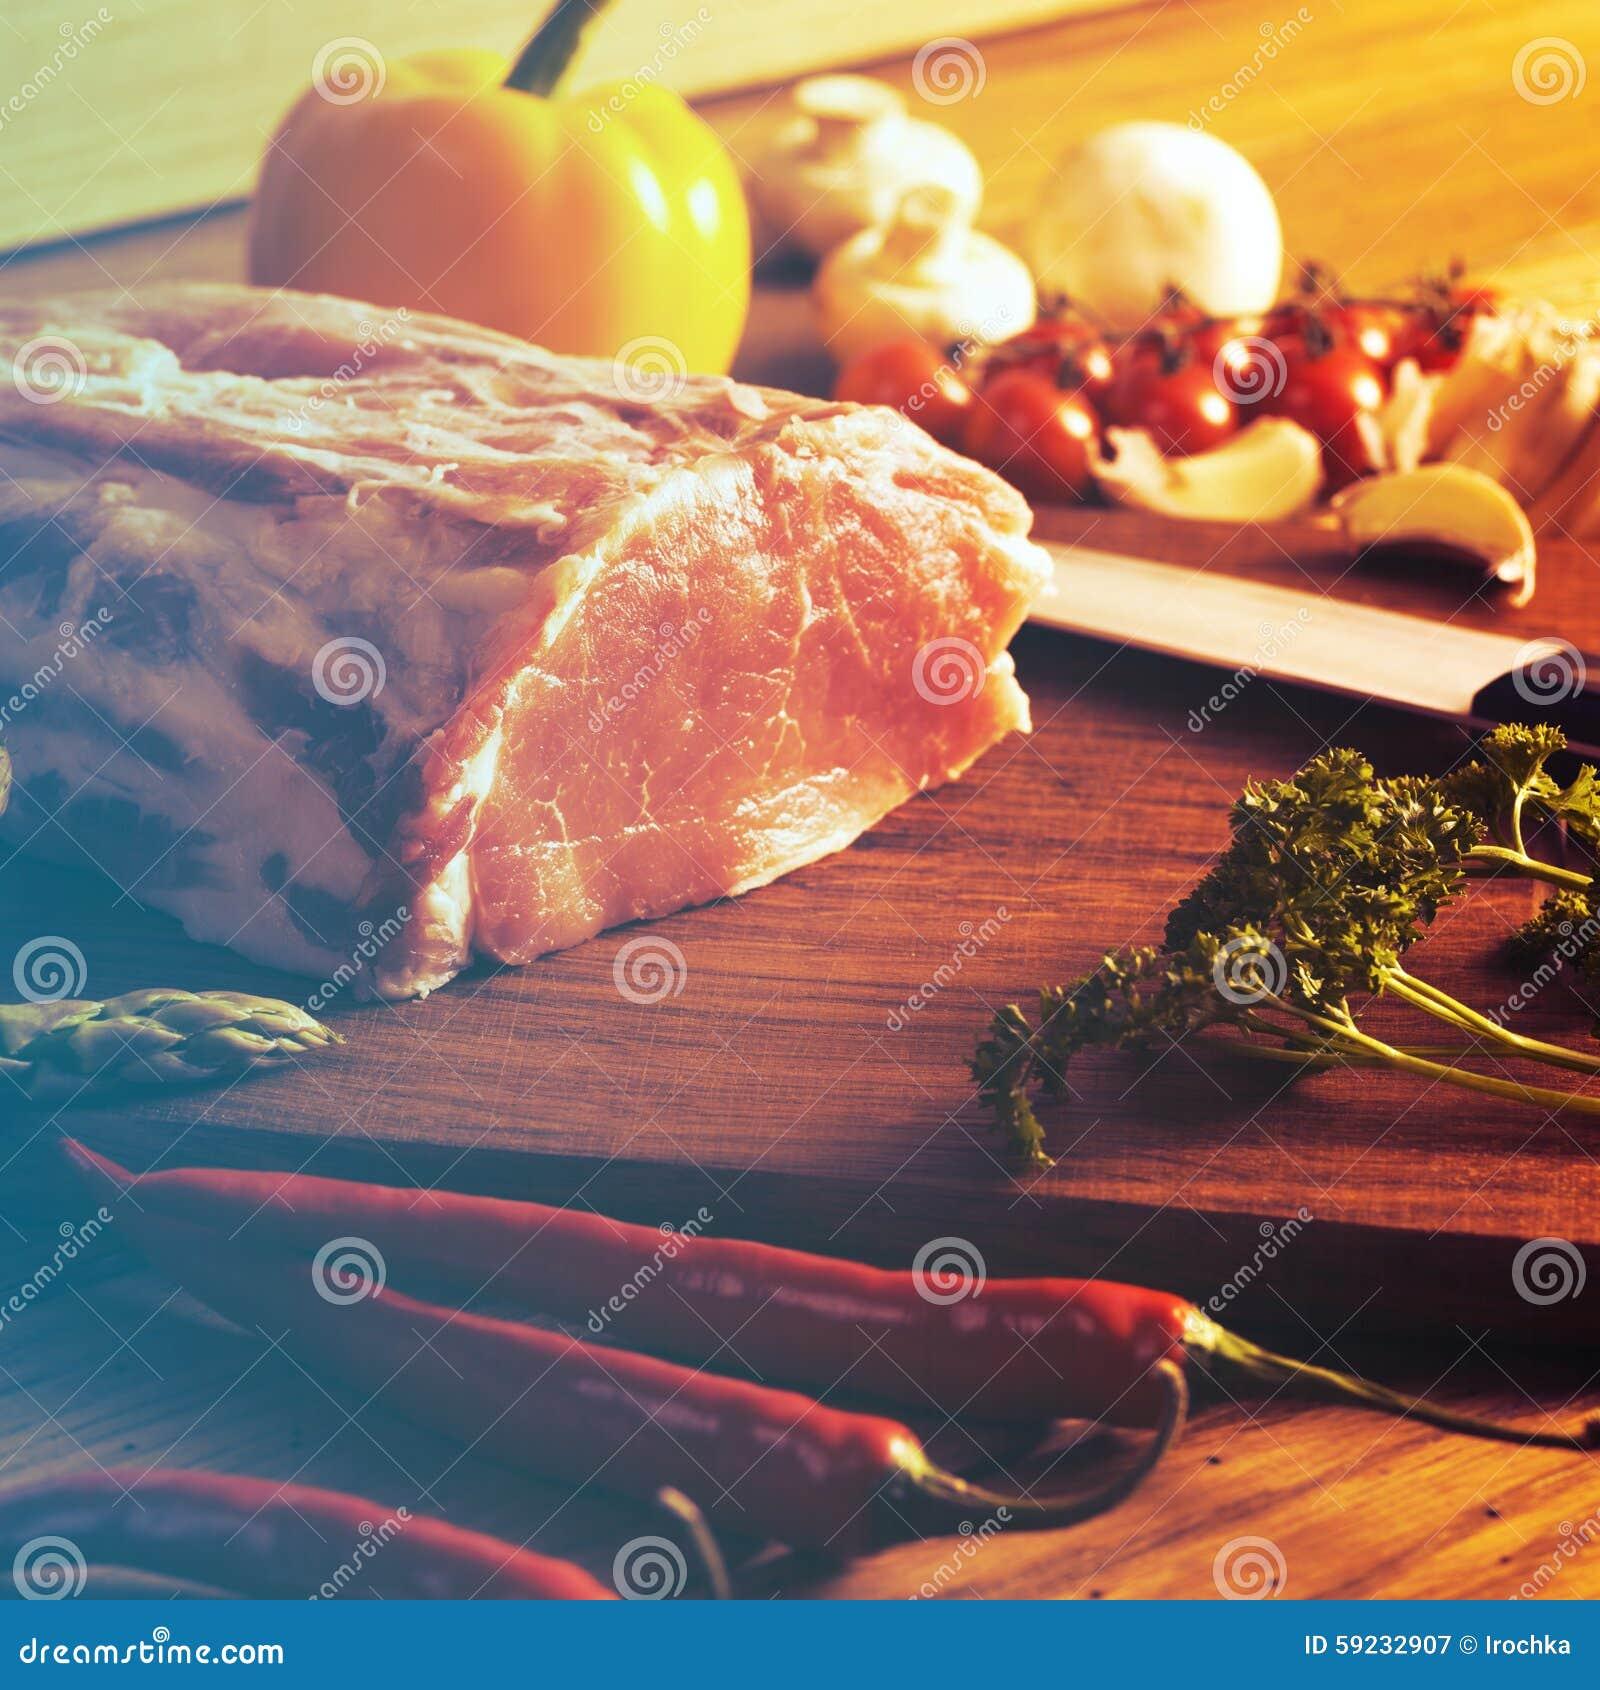 Download Filete sin procesar fresco imagen de archivo. Imagen de fresco - 59232907